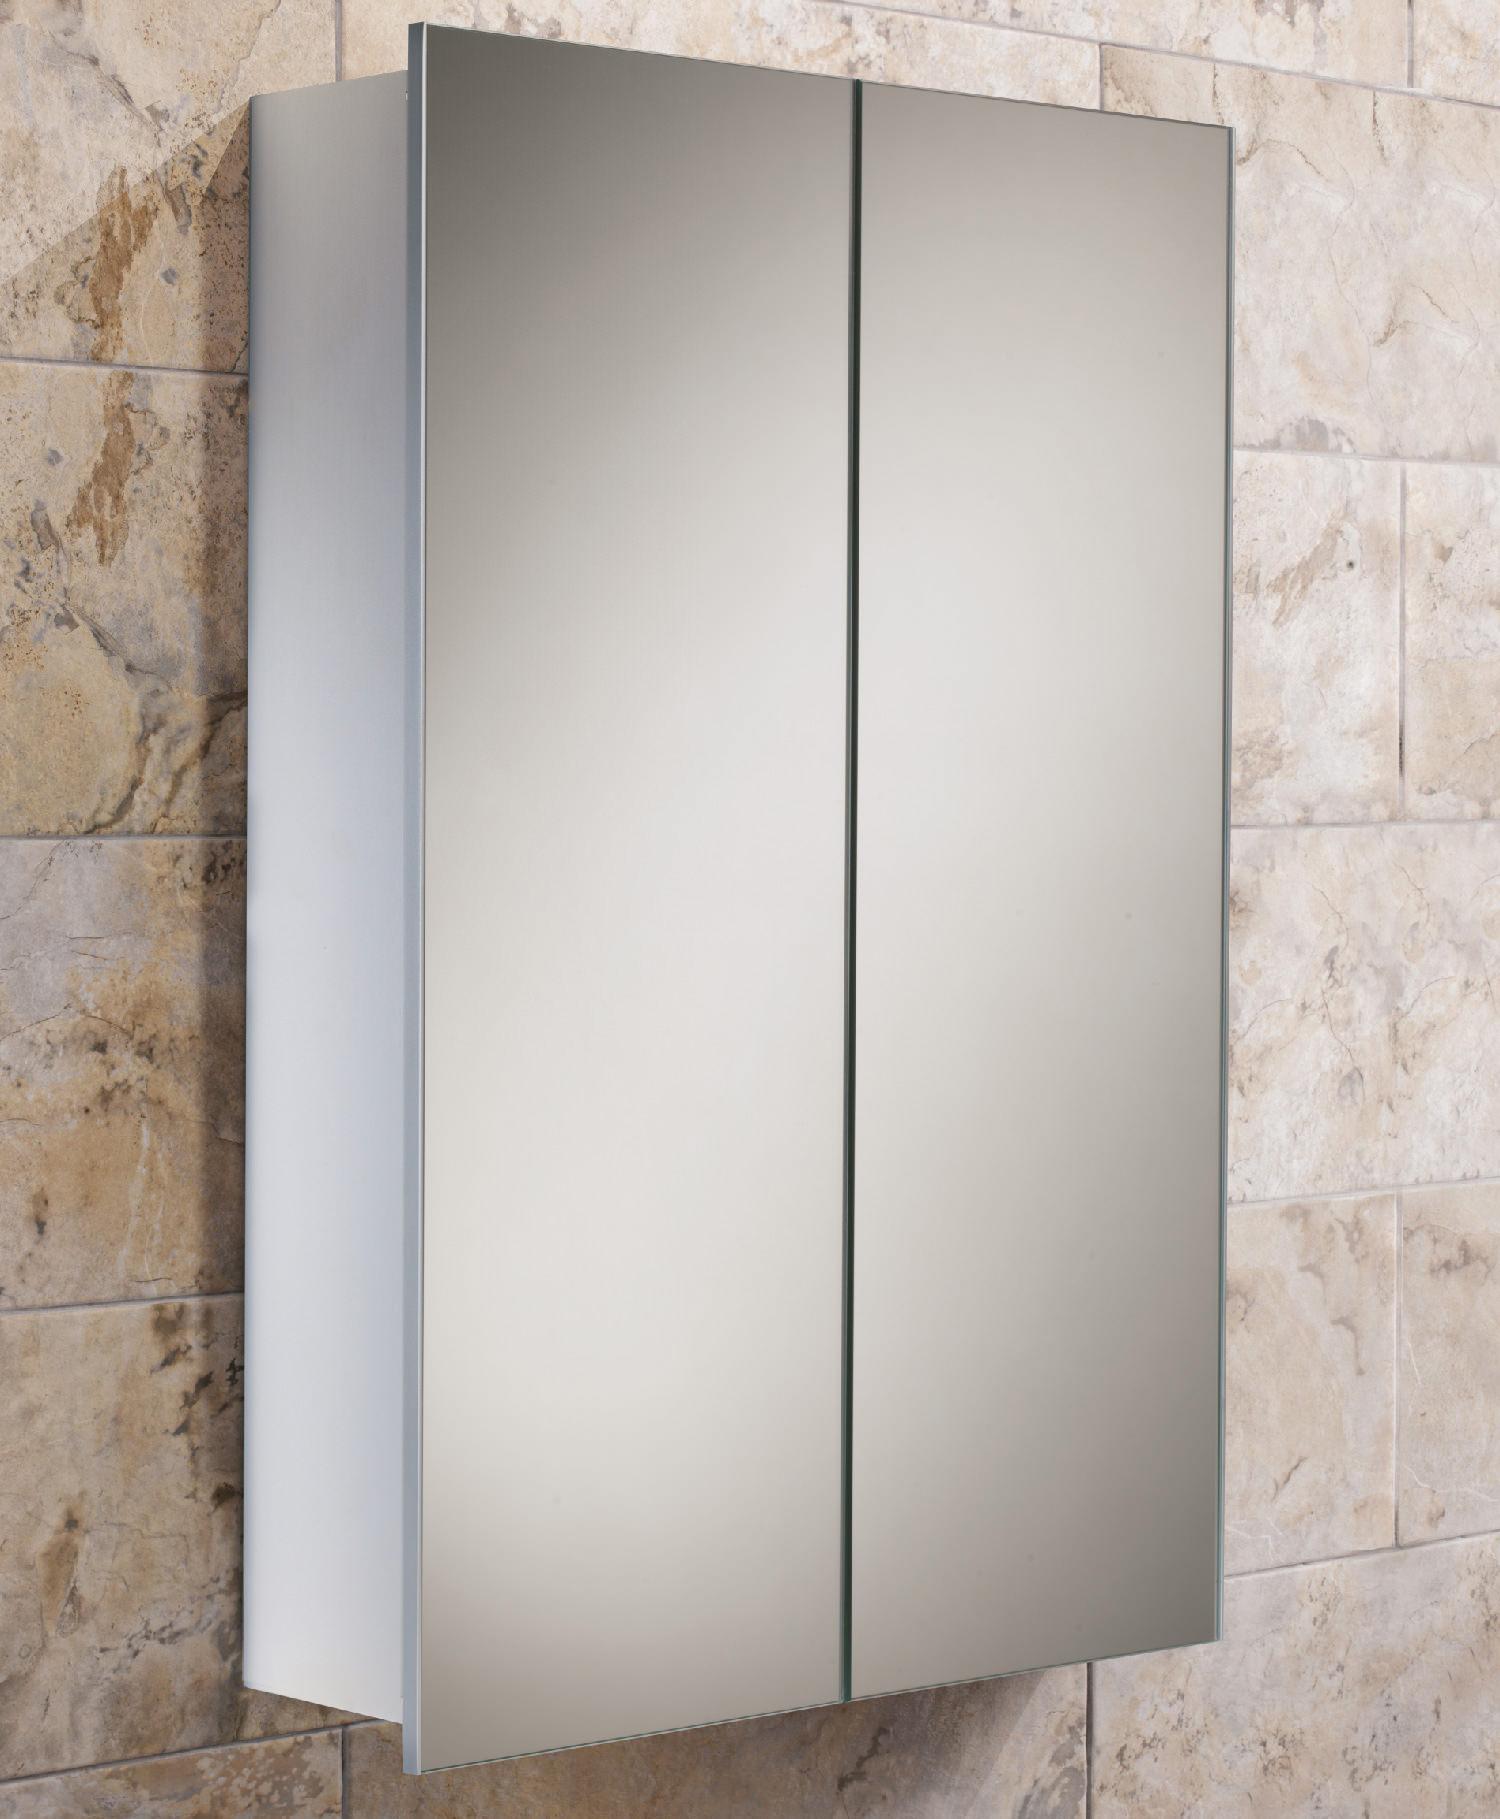 Hib jupiter double door aluminium bathroom cabinet 450 x 700mm for Bathroom cabinet 700